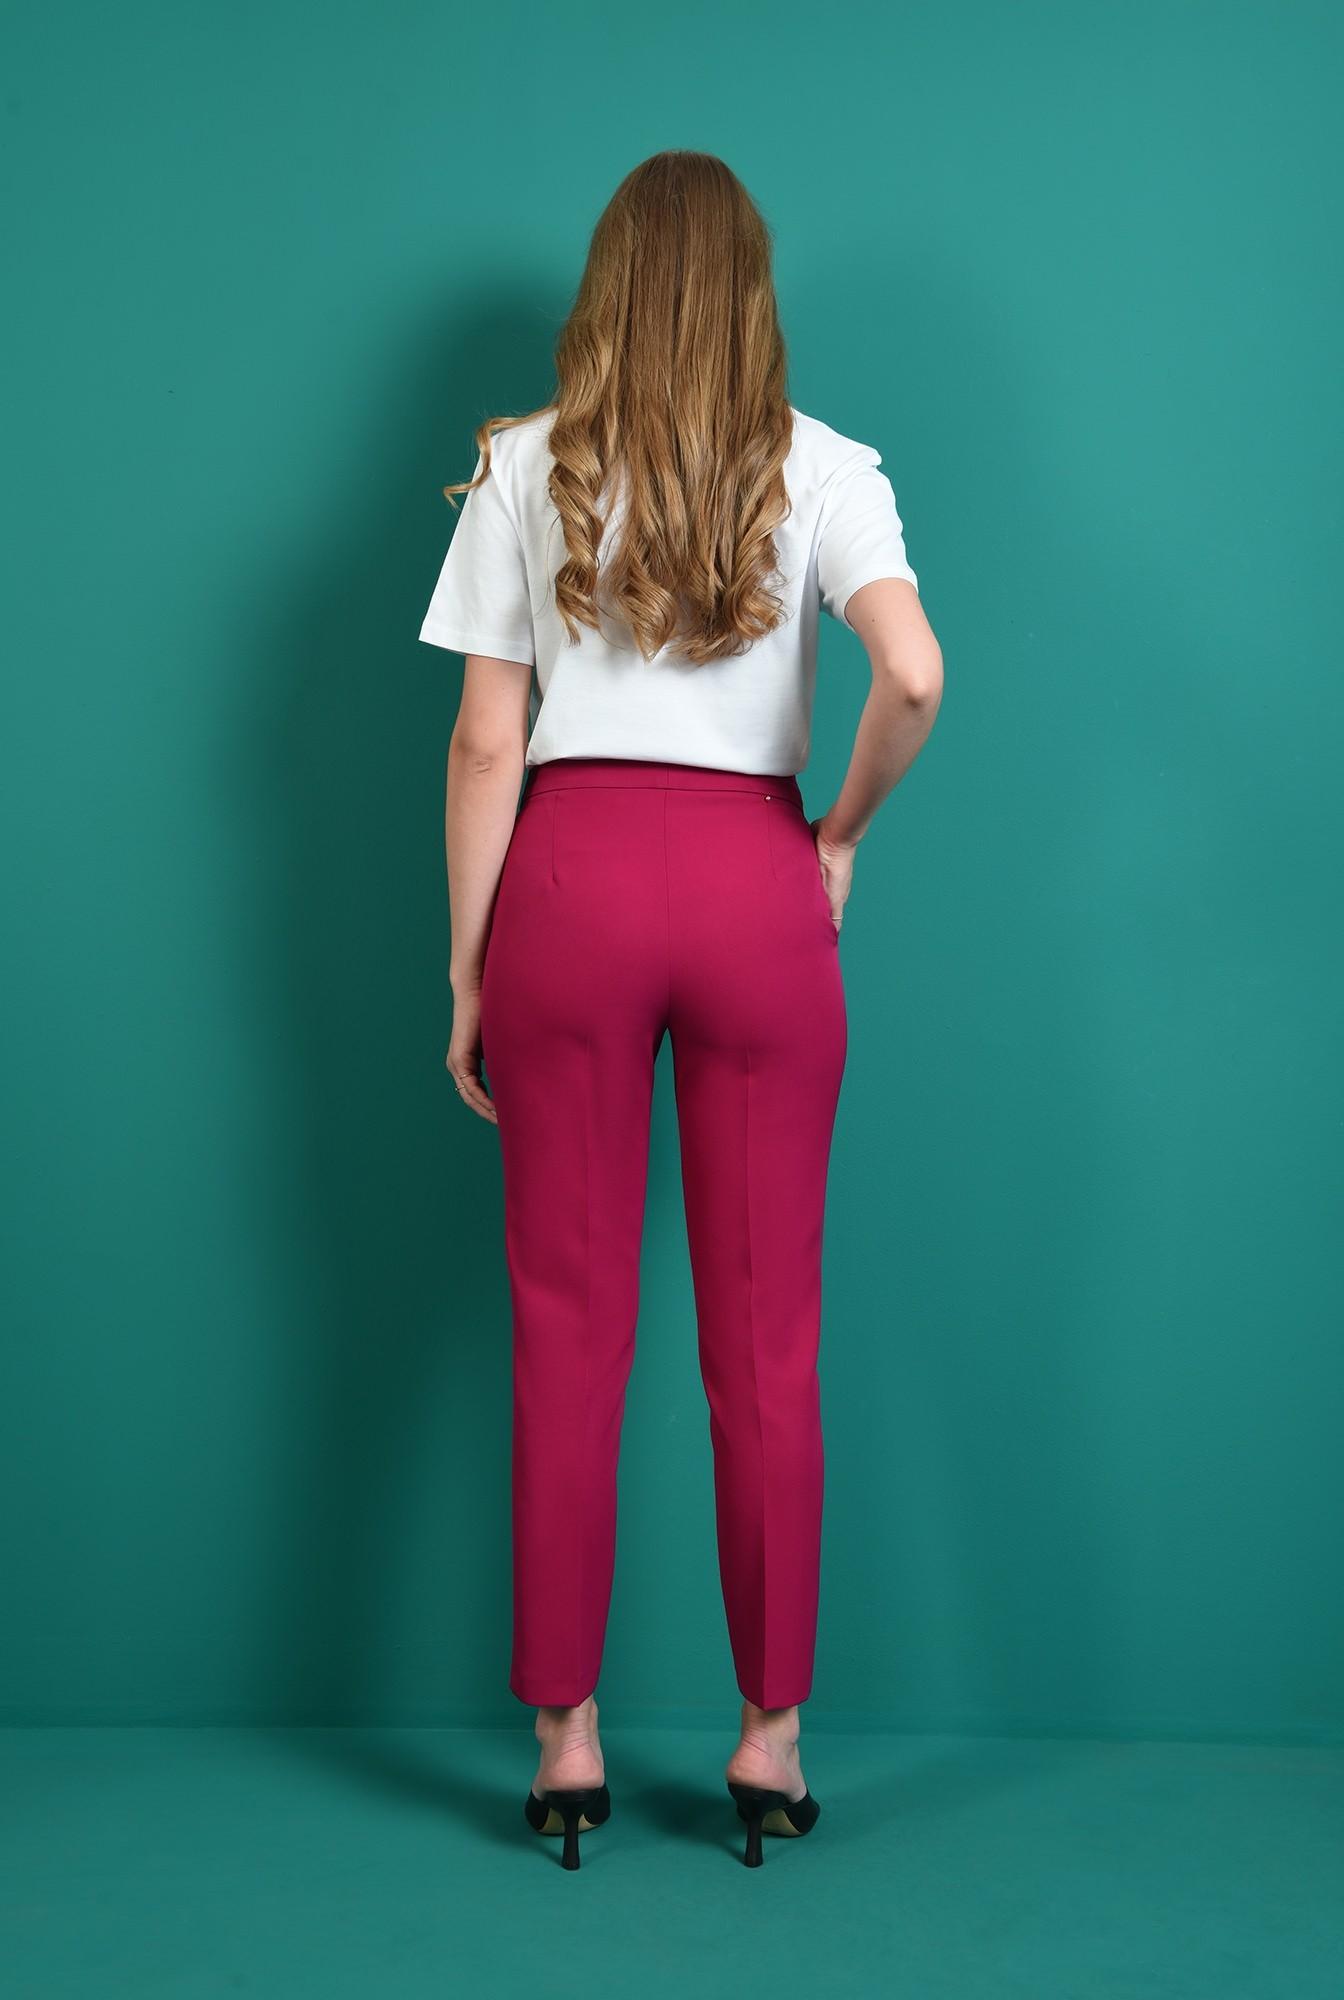 1 - pantaloni lungi, magenta, cu buzunar, Poema